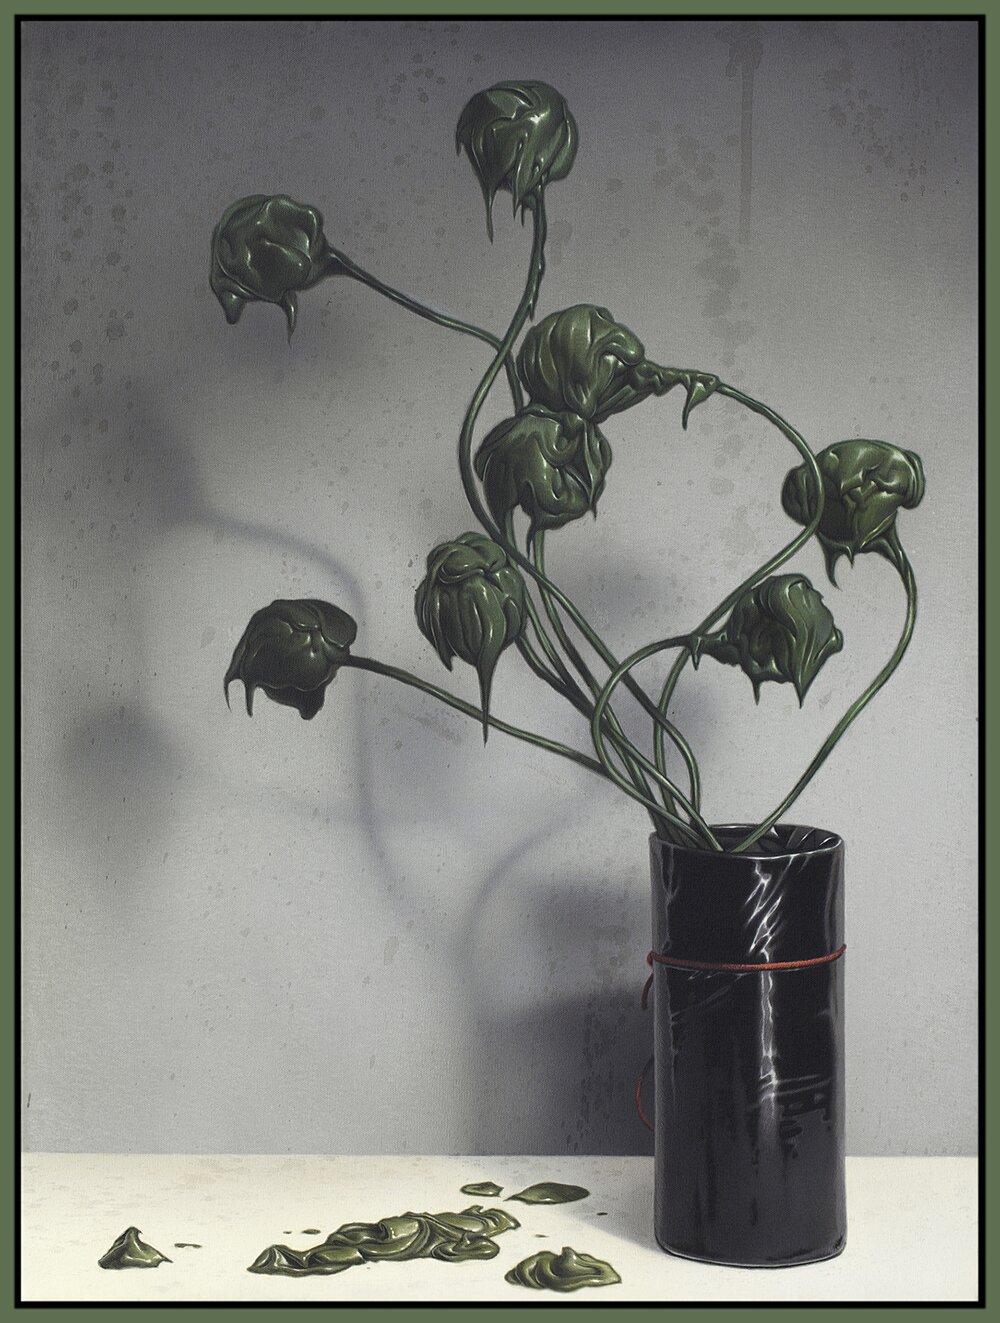 dipinti-eckart-hahn-15-keb